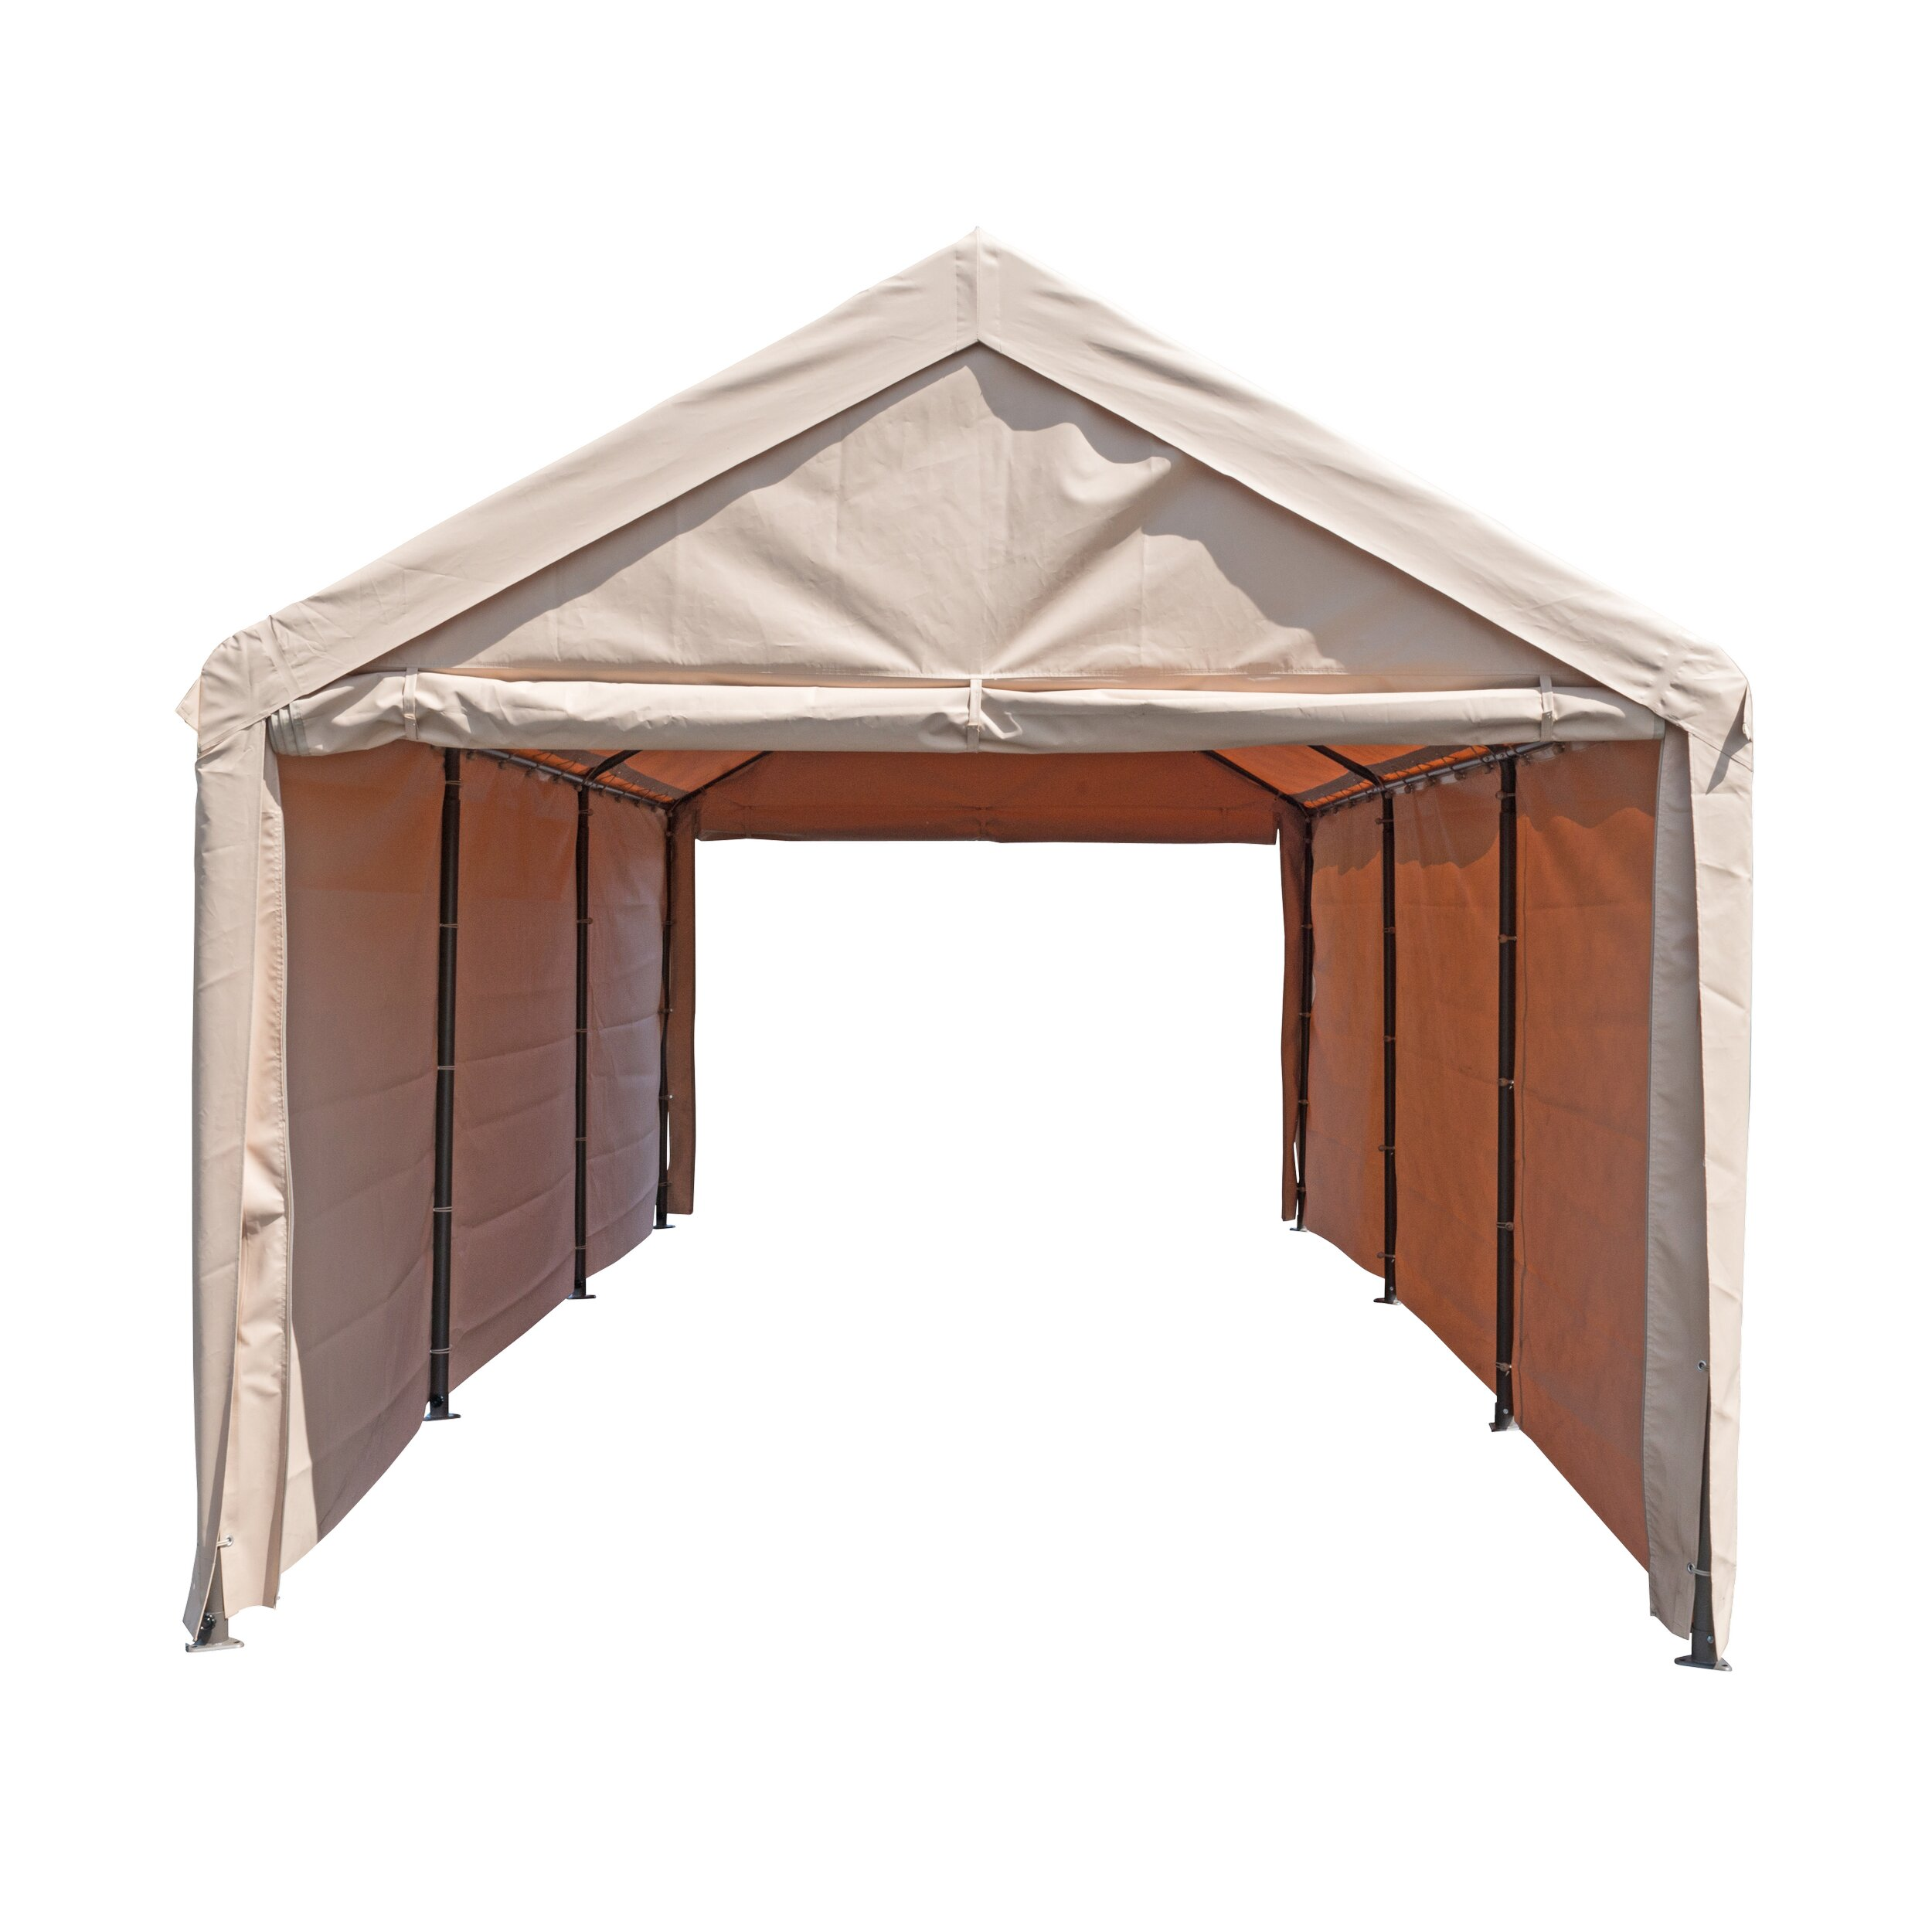 Enclosed Car Canopy 10x20 : Sorara™ usa ft w d car port wayfair